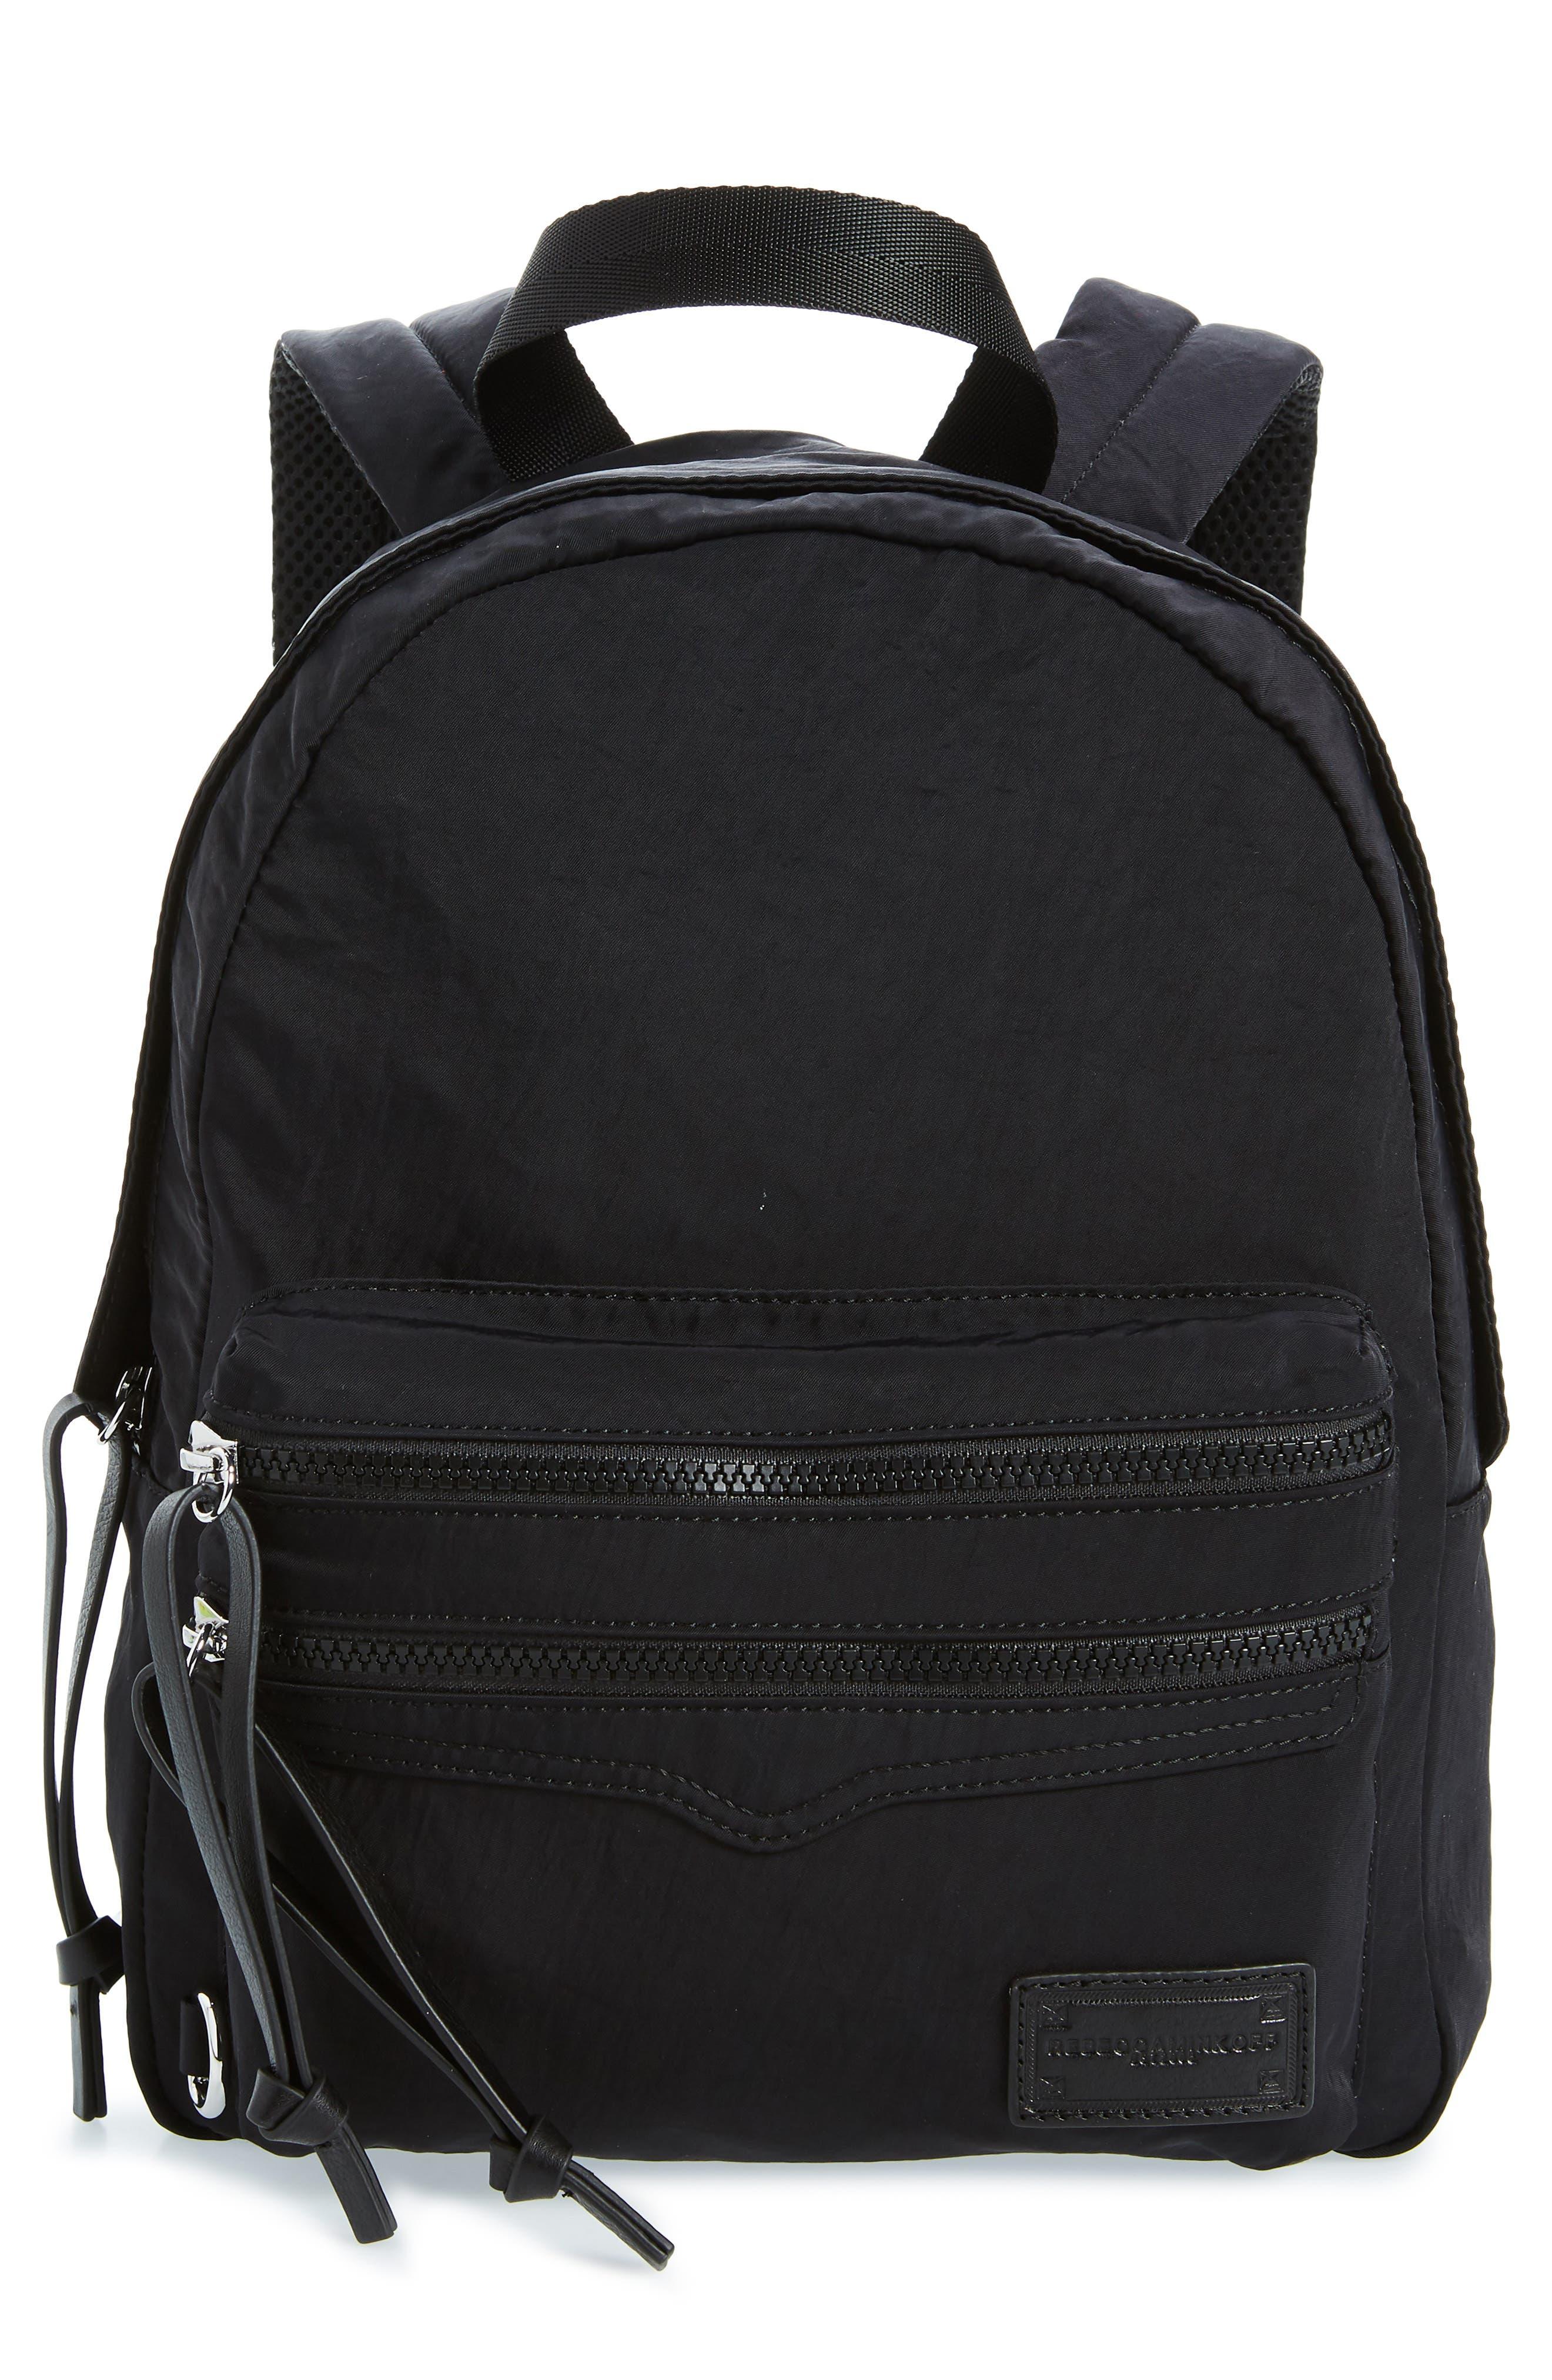 REBECCA MINKOFF Nylon Backpack, Main, color, BLACK